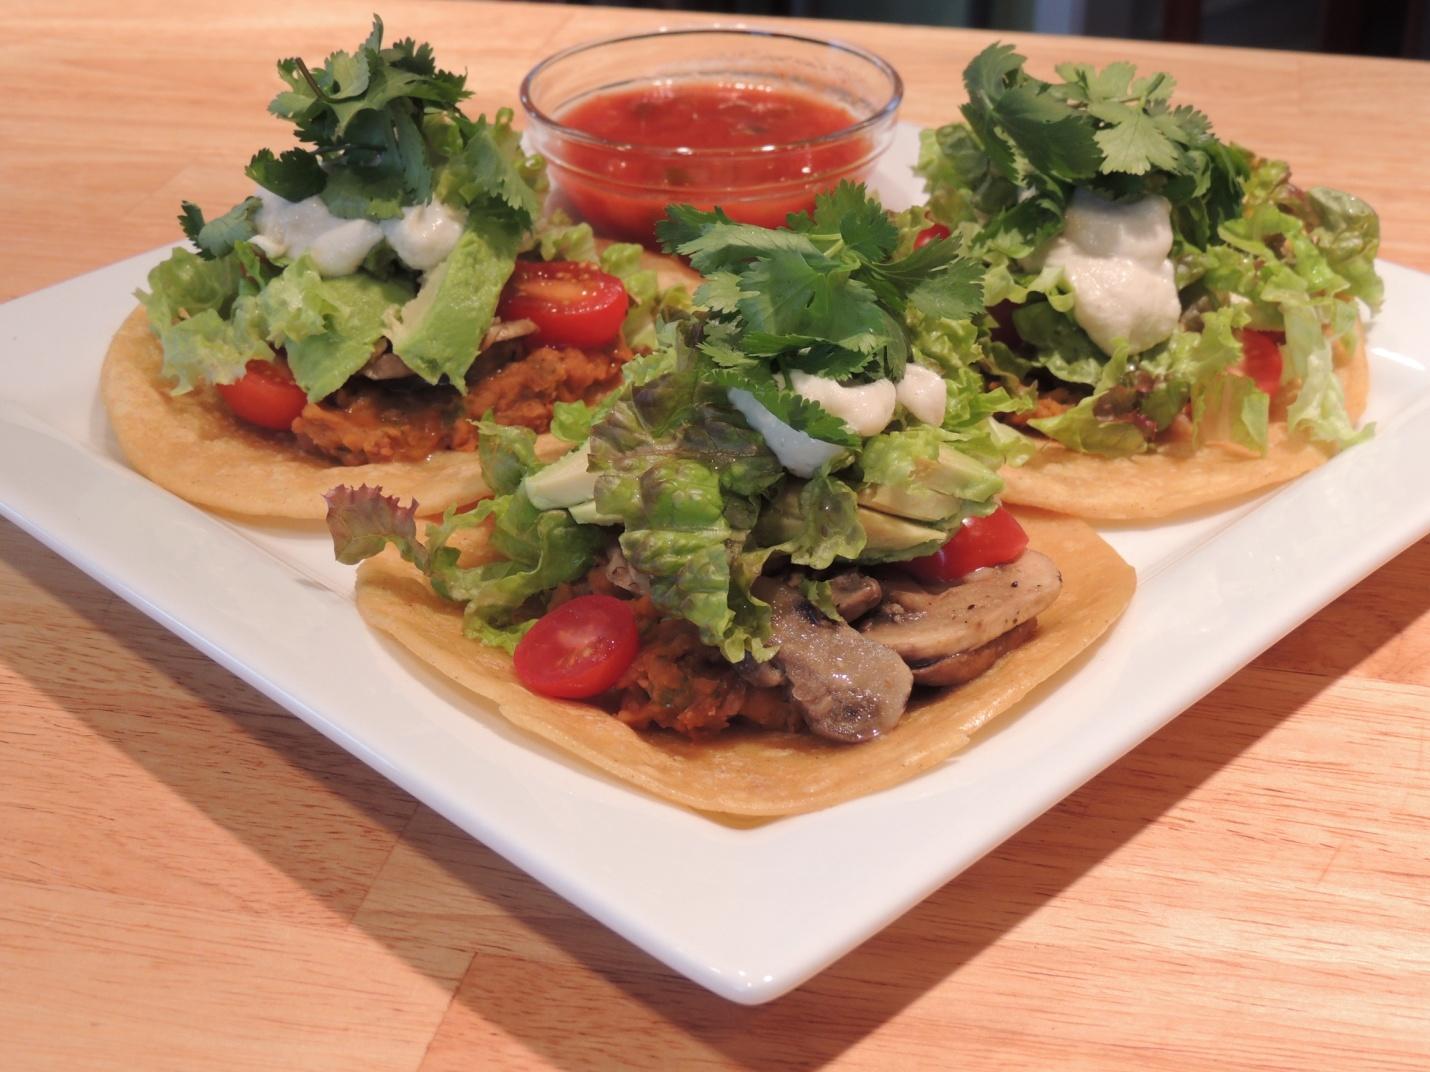 Meatless Taco Tuesday